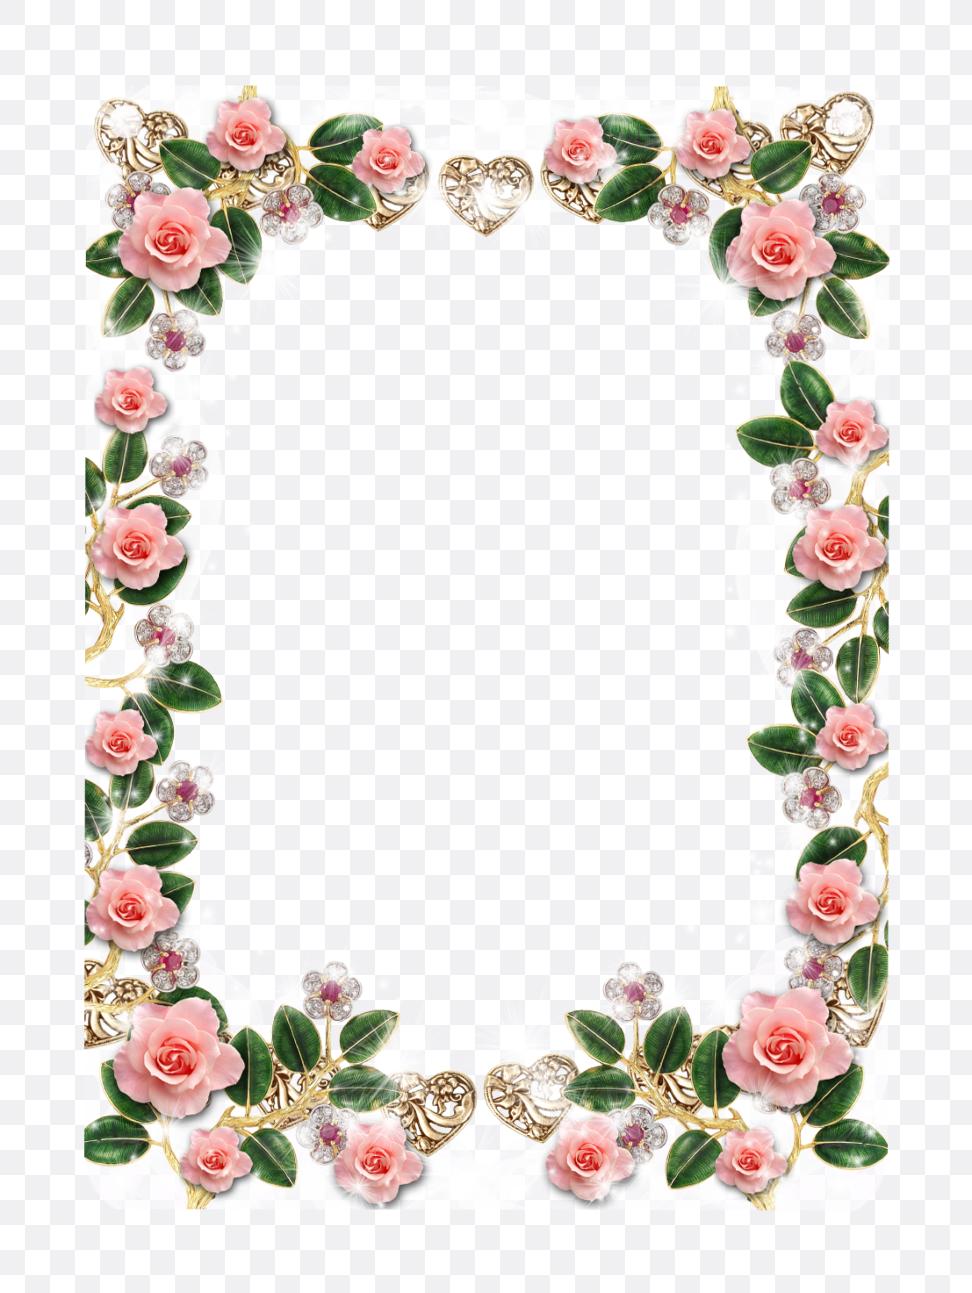 floral border designs